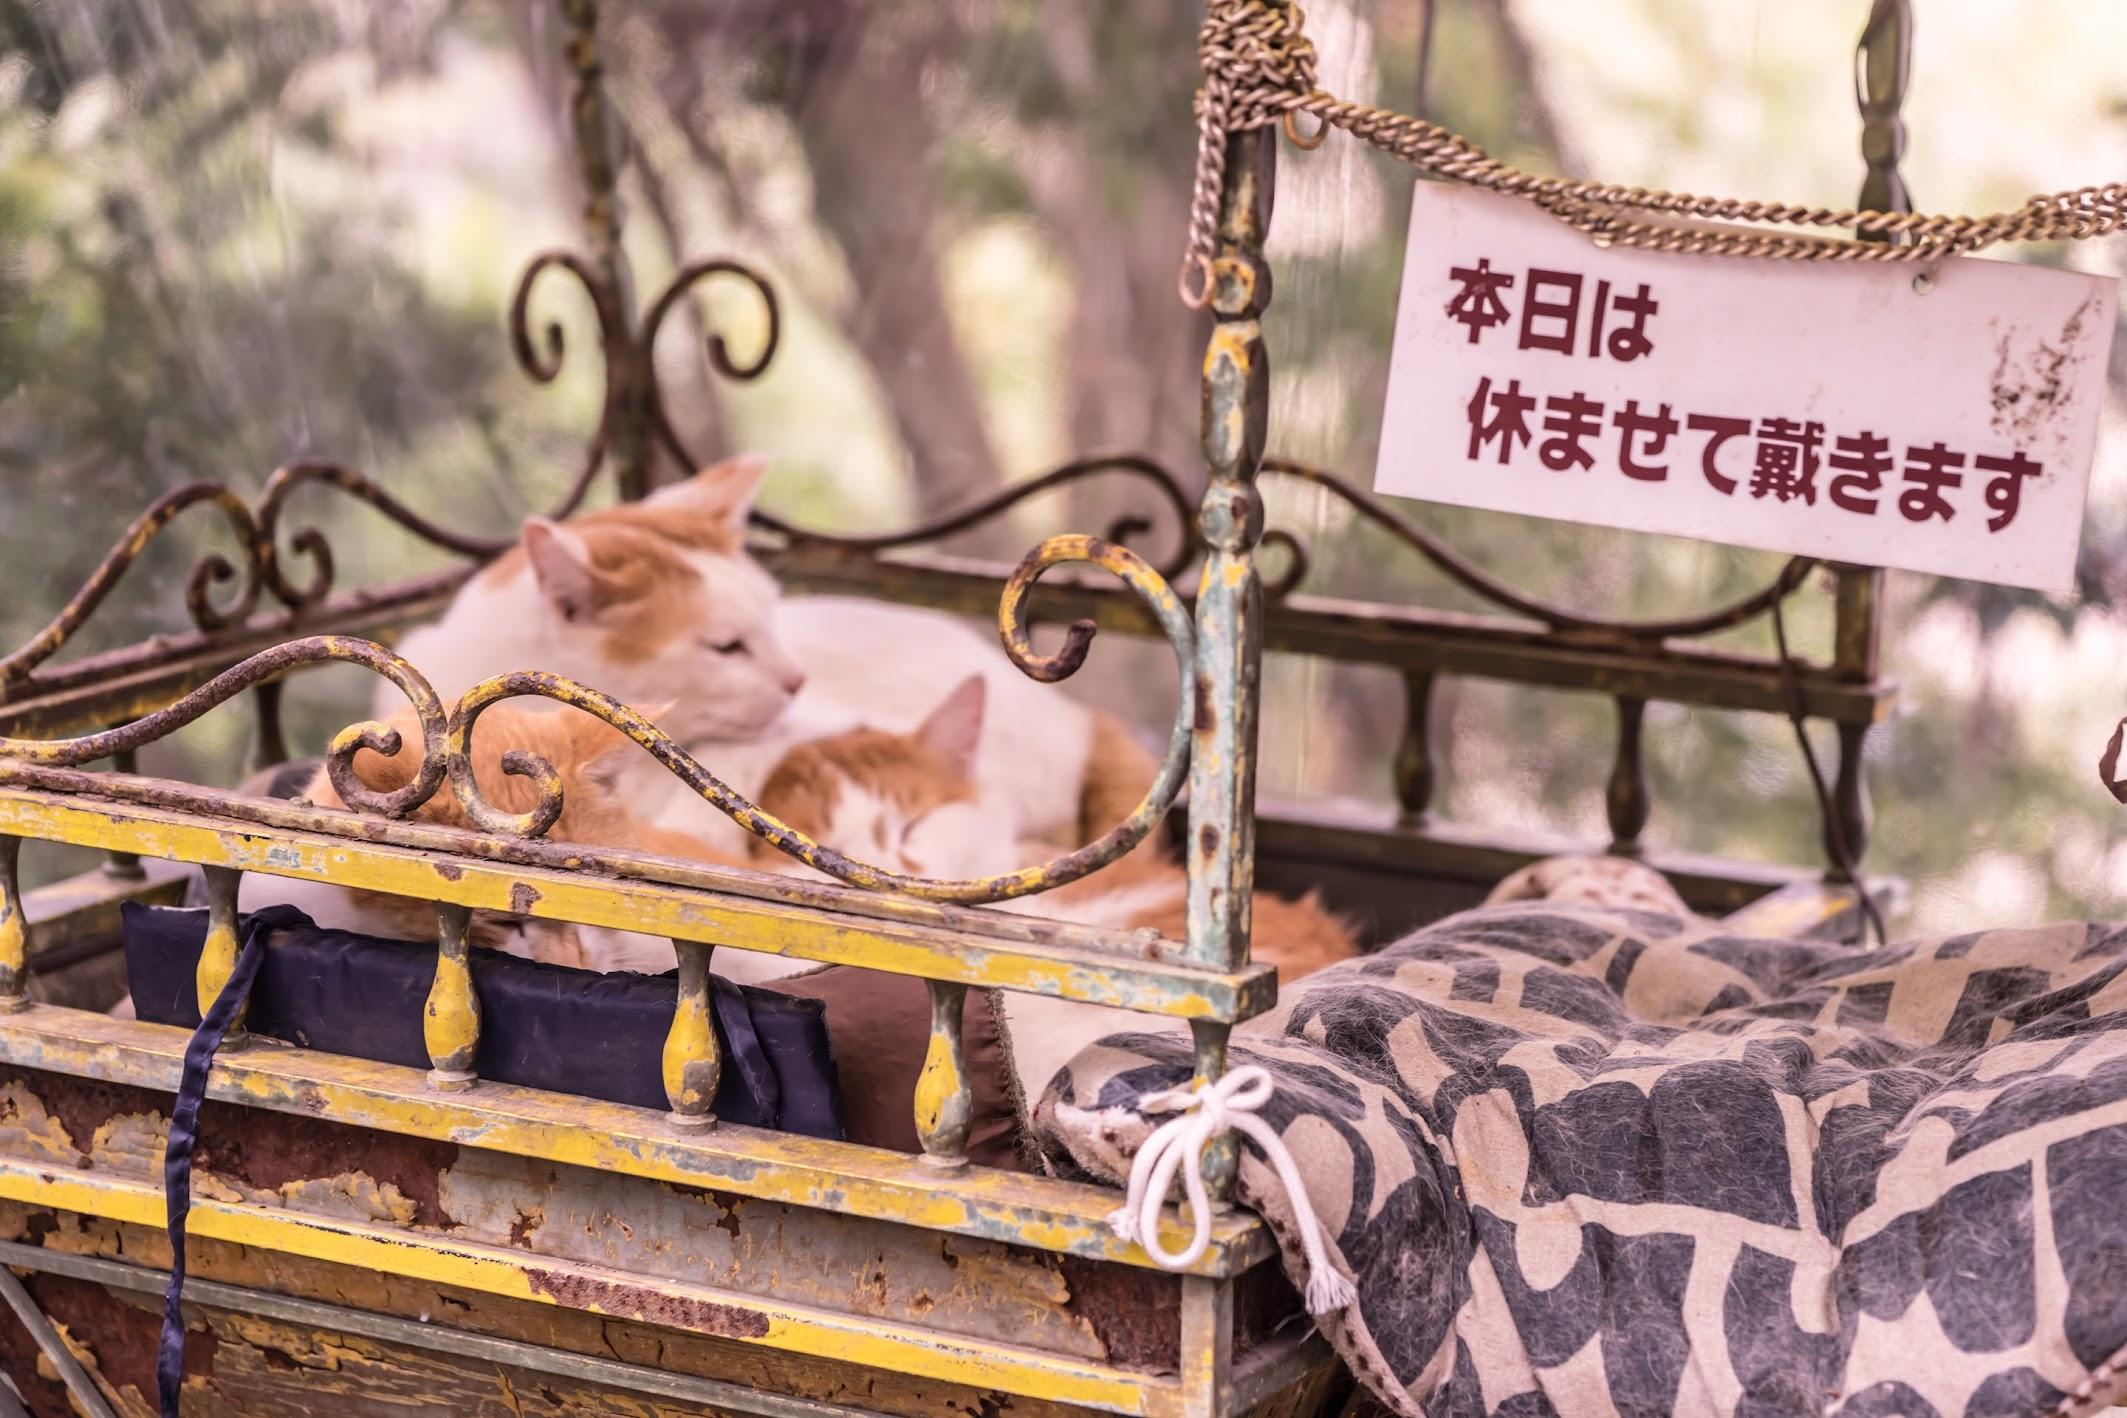 京都 哲学の道 猫 喫茶店